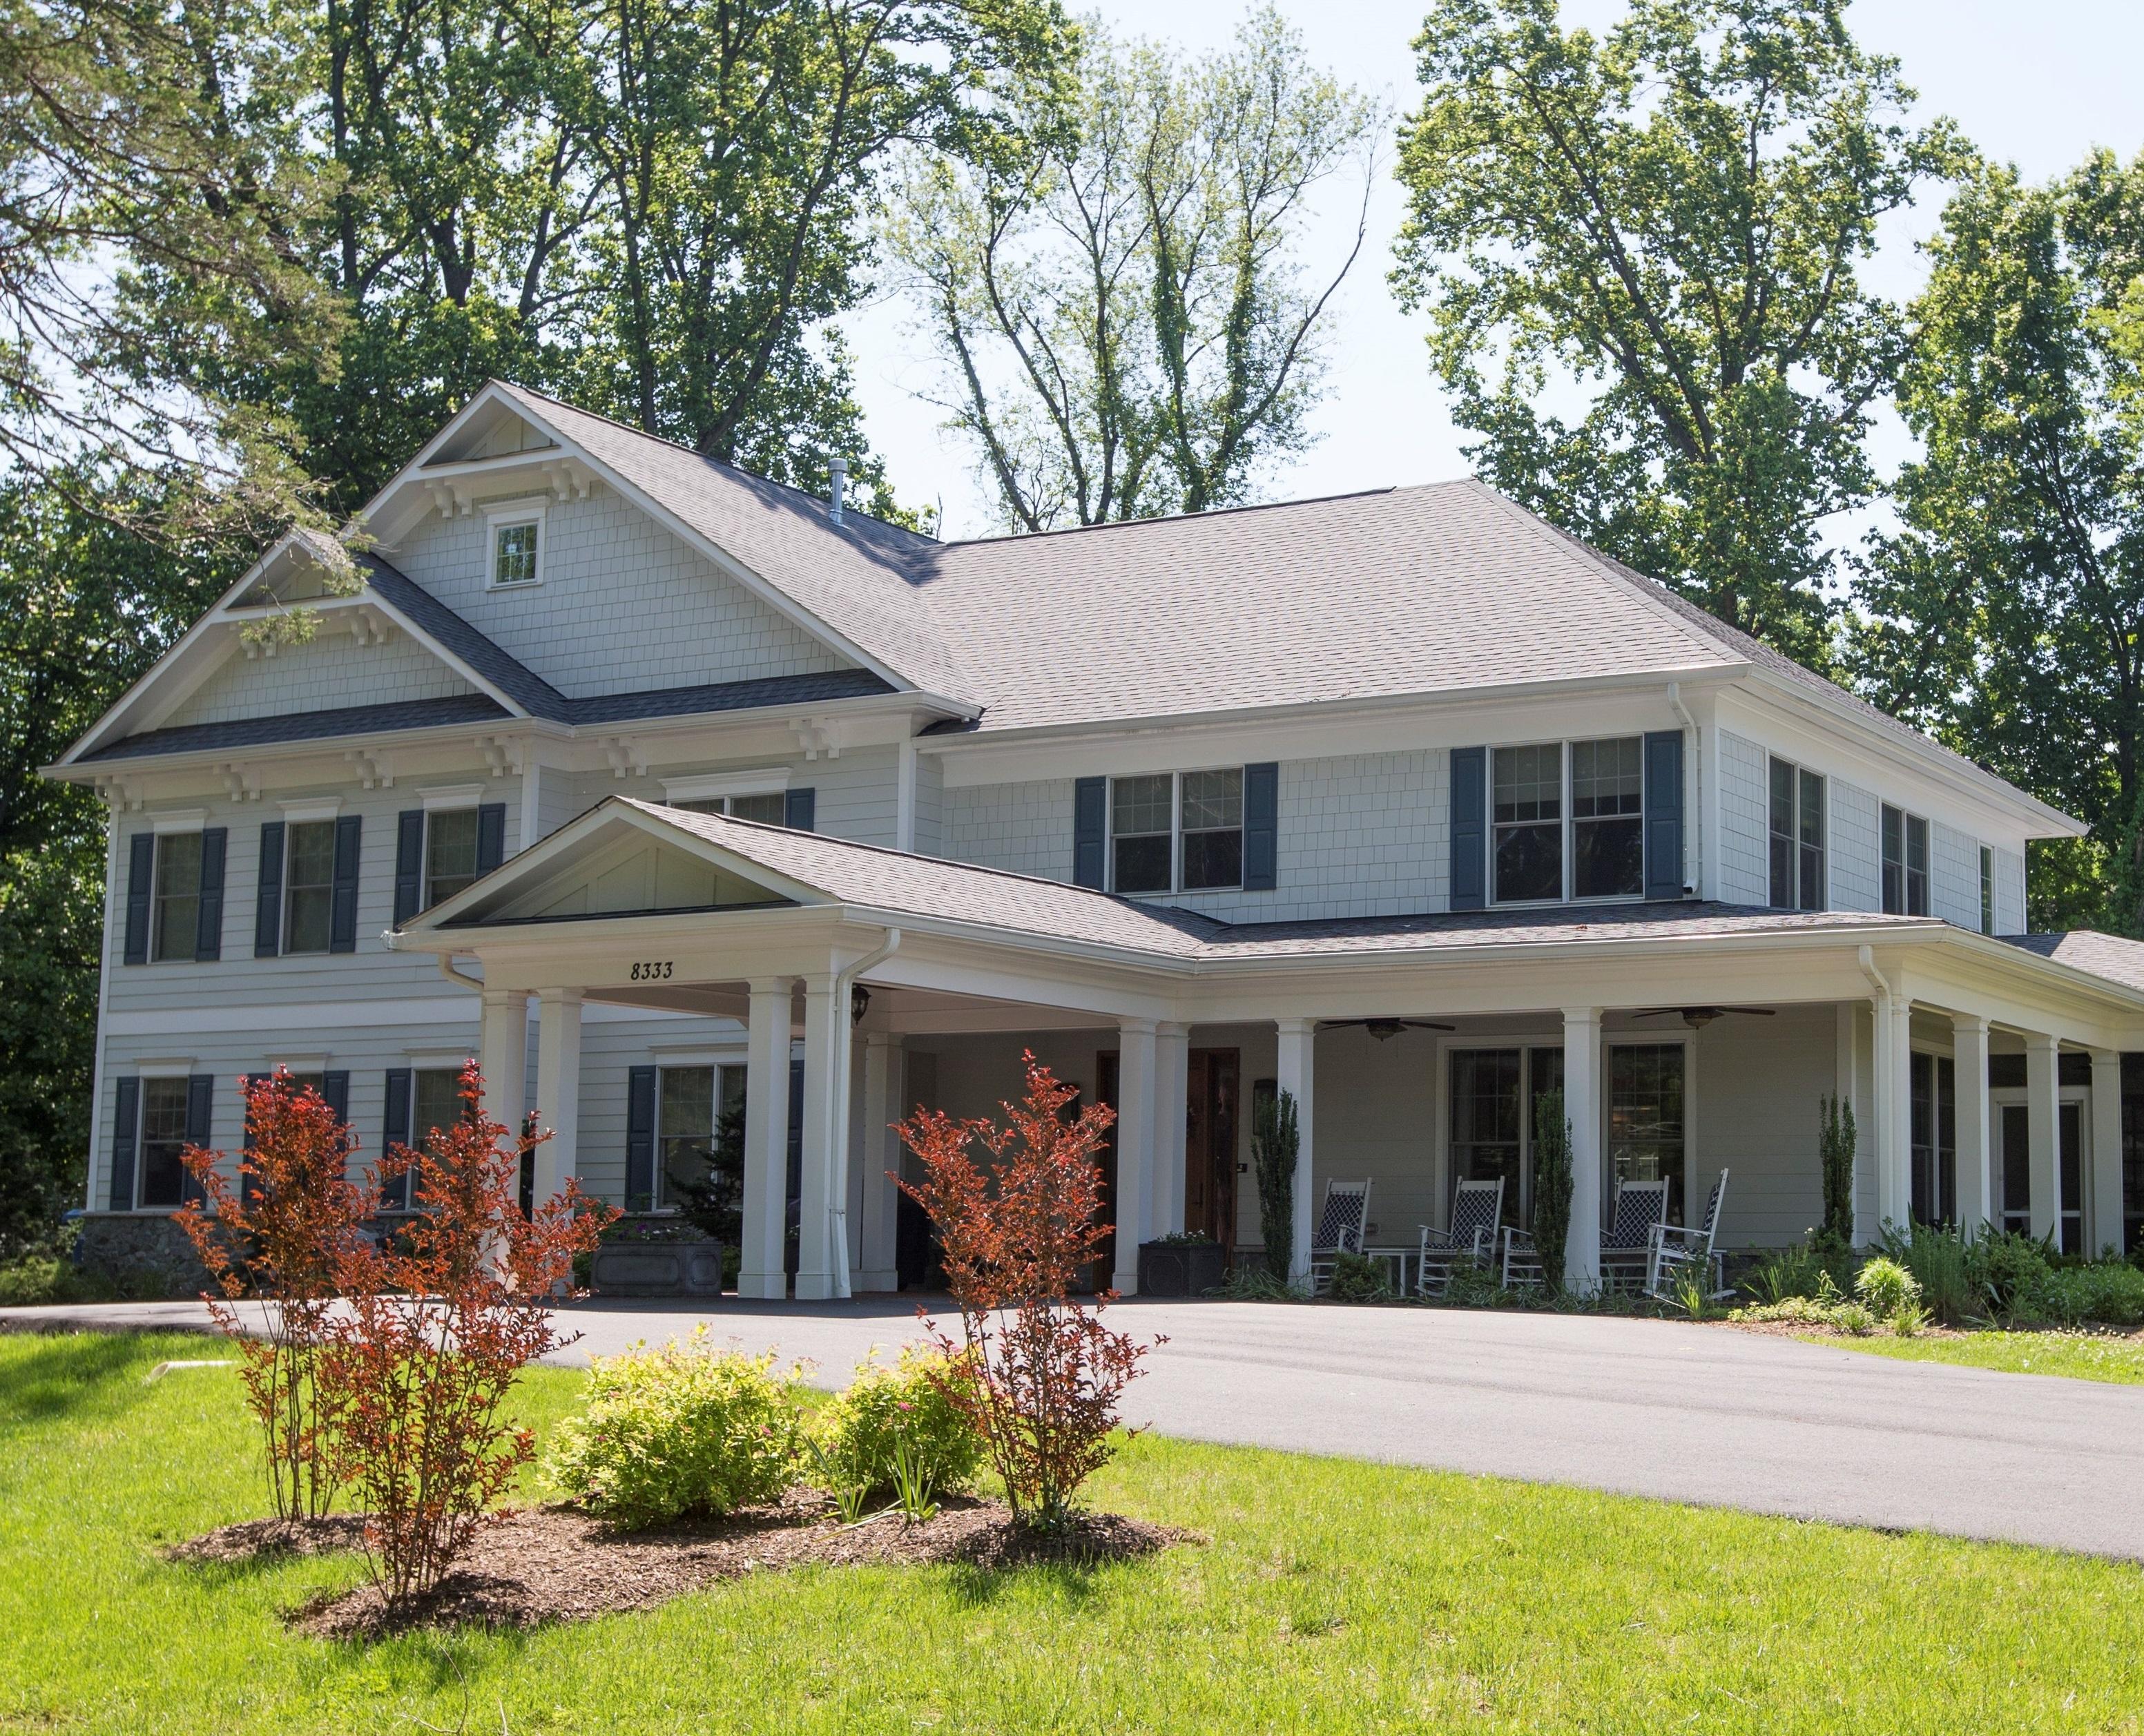 8333 house